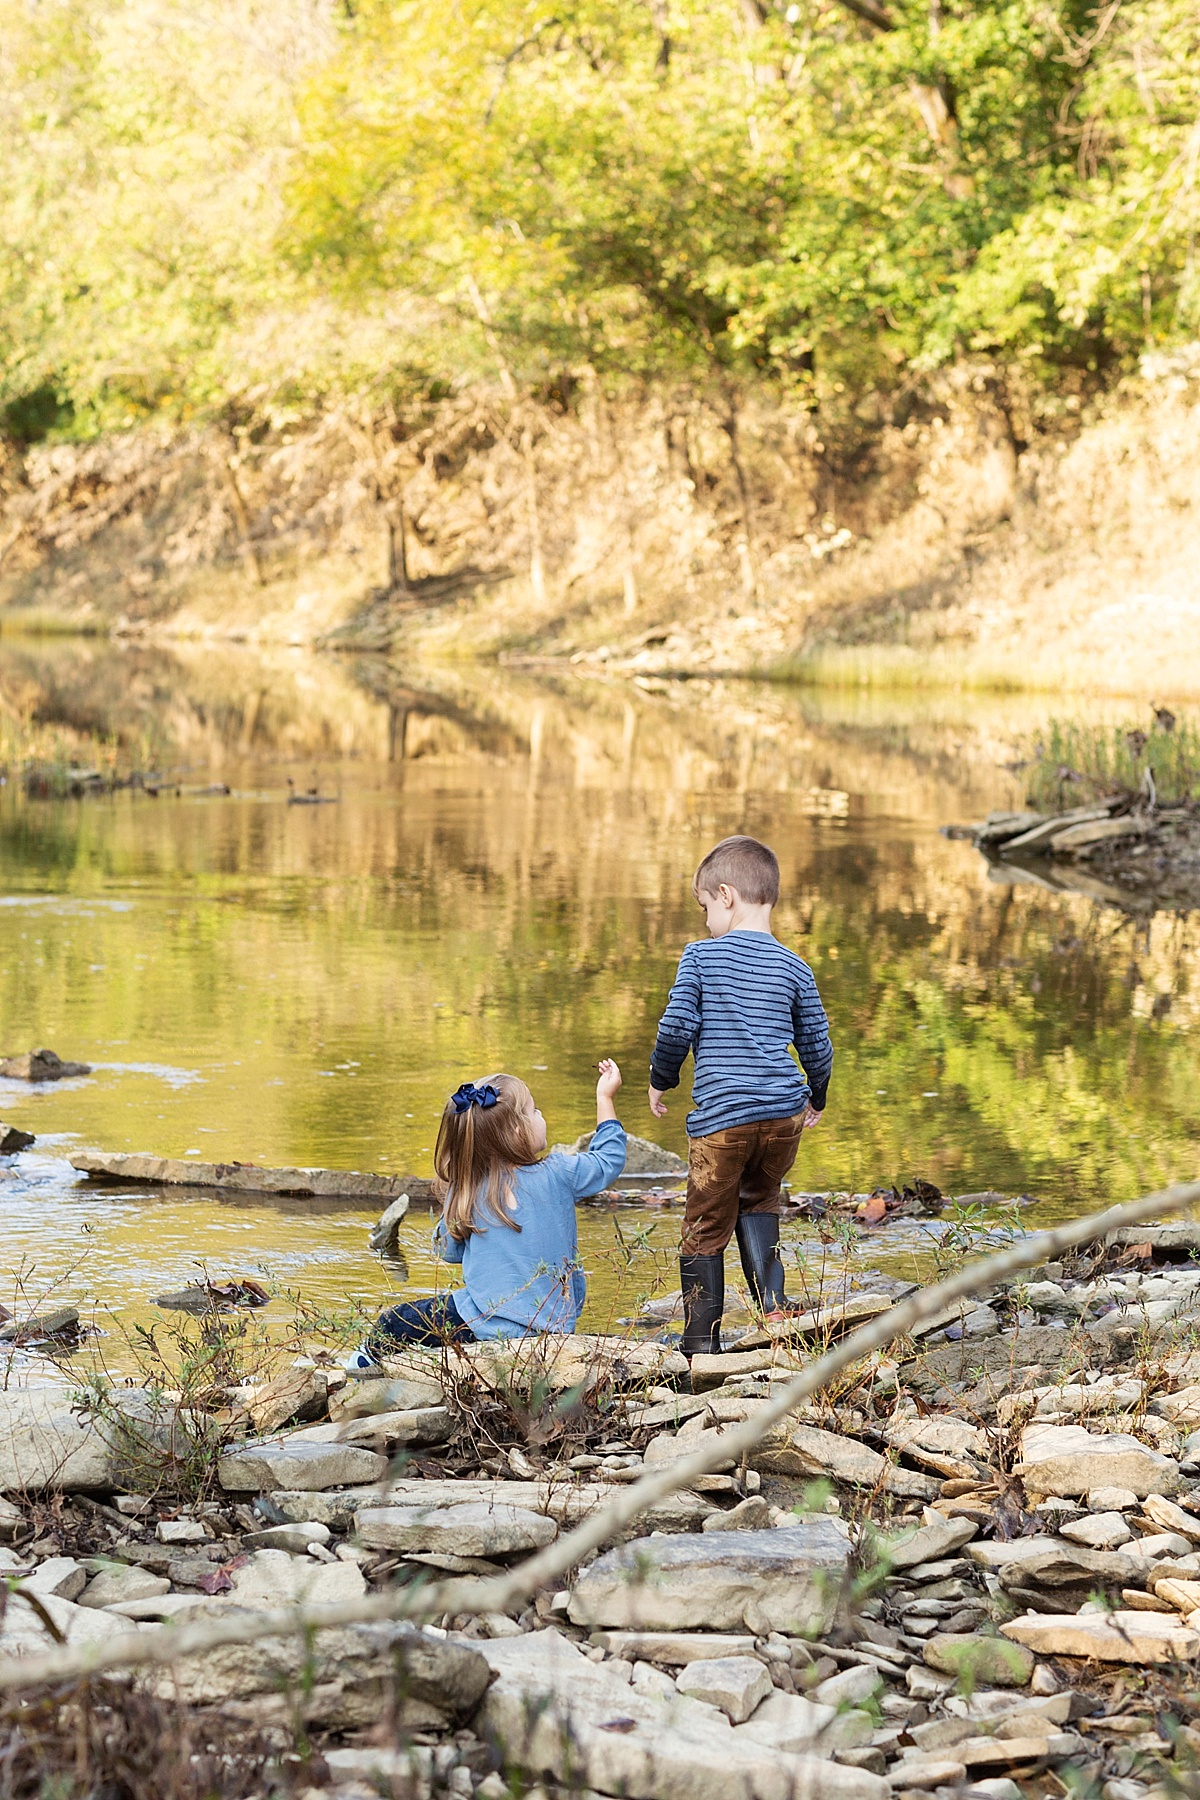 kentucky-family-farm-photos-in-the-creek-042.JPG